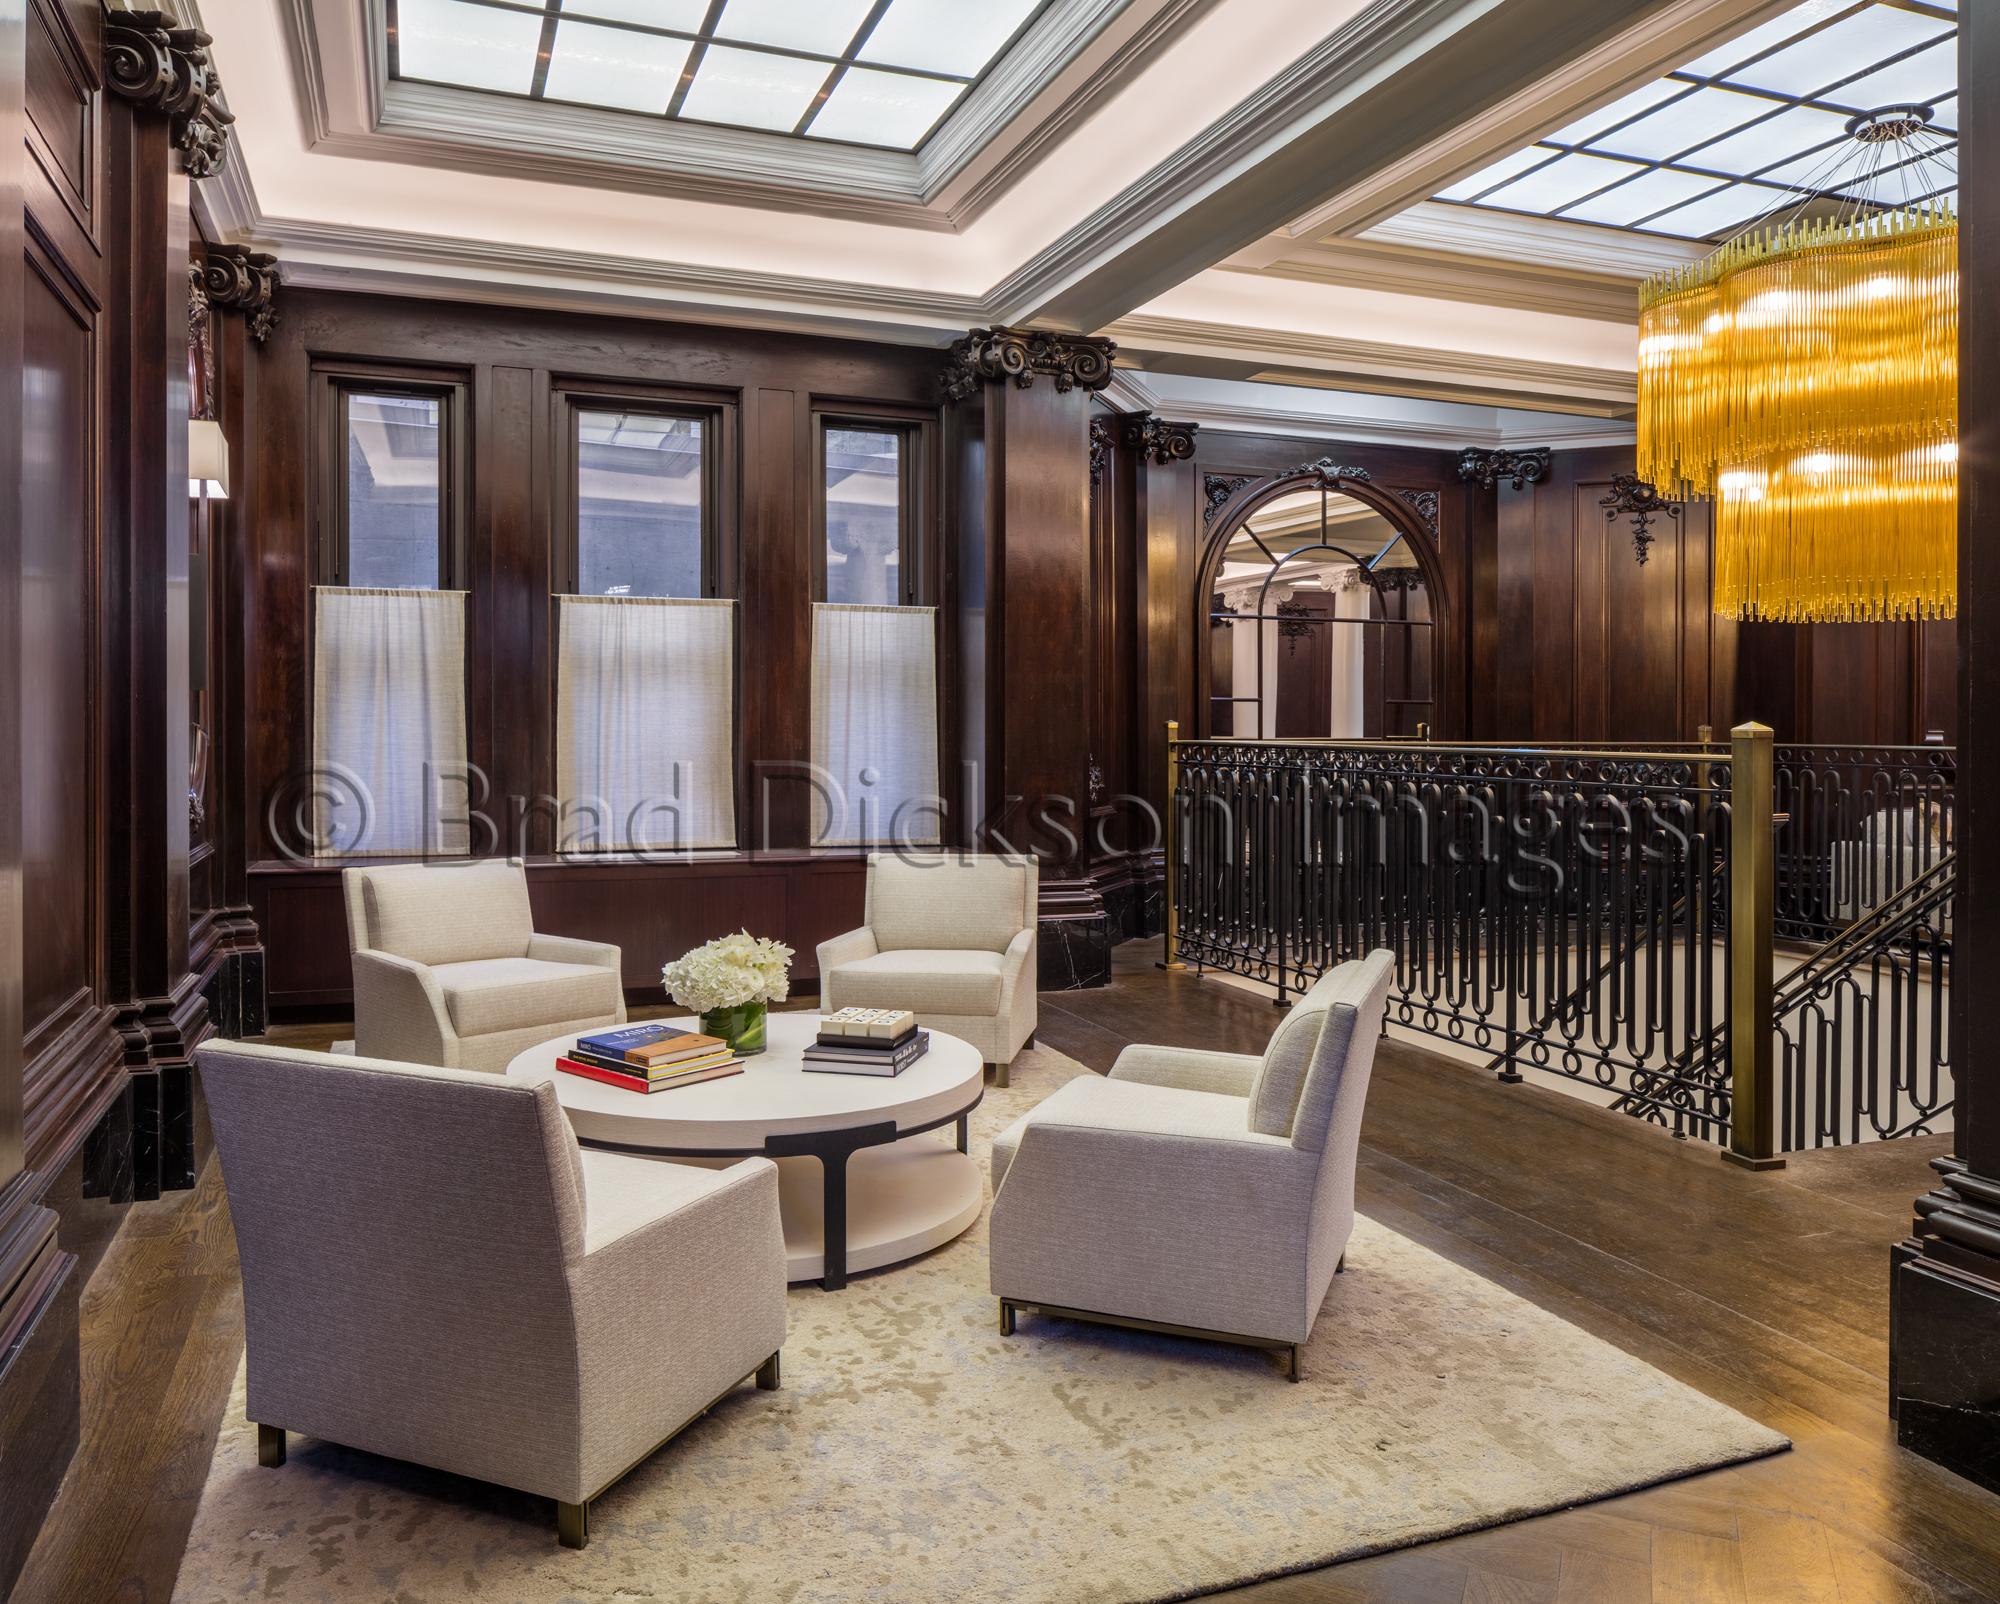 Chatsworth lobby 7